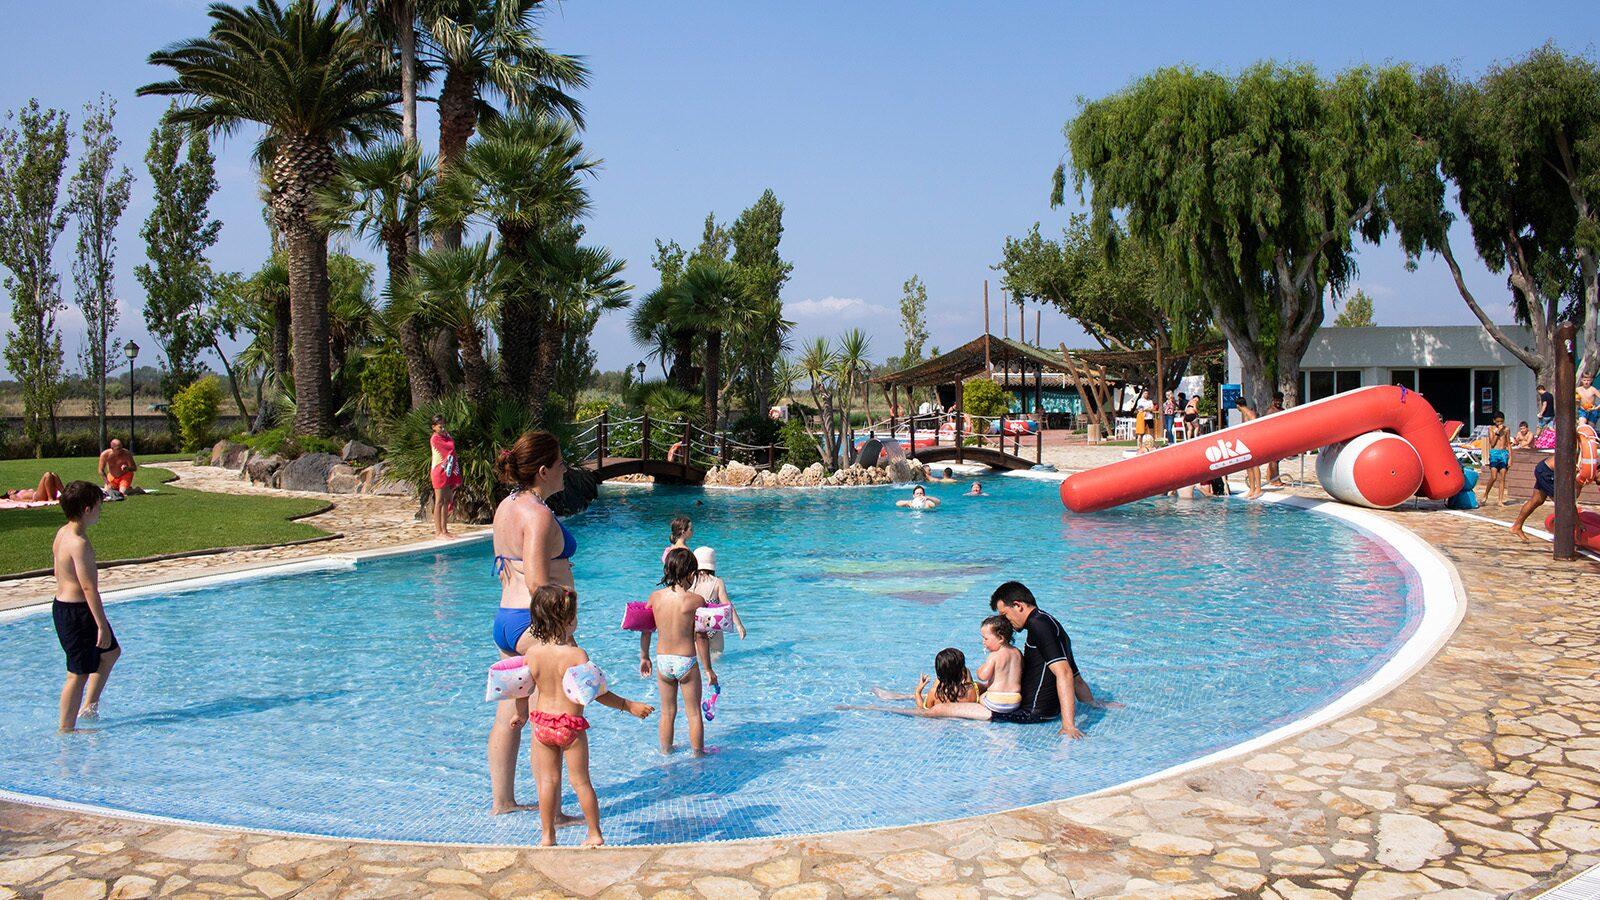 Nautic Almata | Tente de luxe pour 5personnes